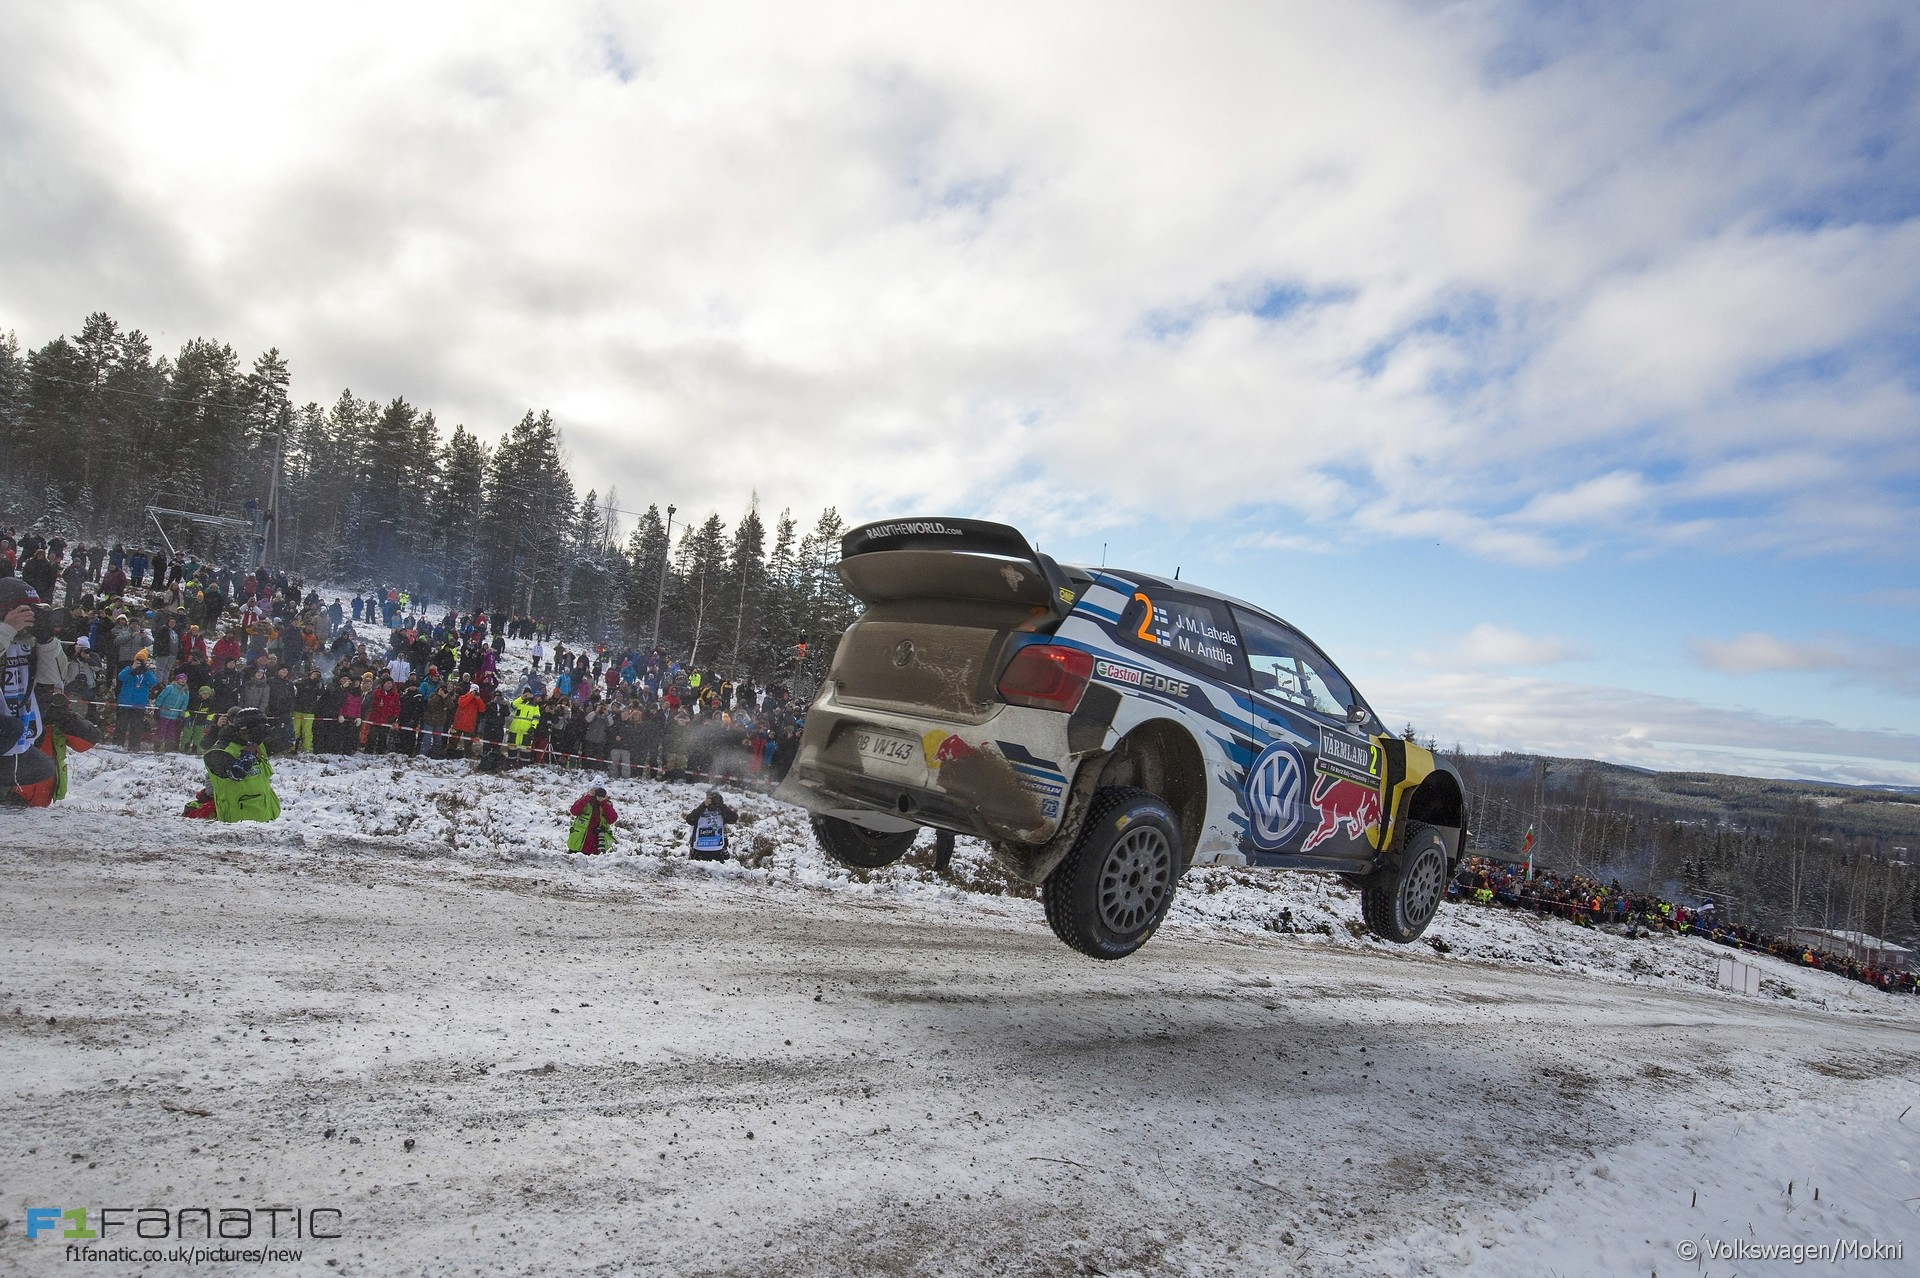 Jari-Matti Latvala, Volkswagen, WRC, Sweden, 2016